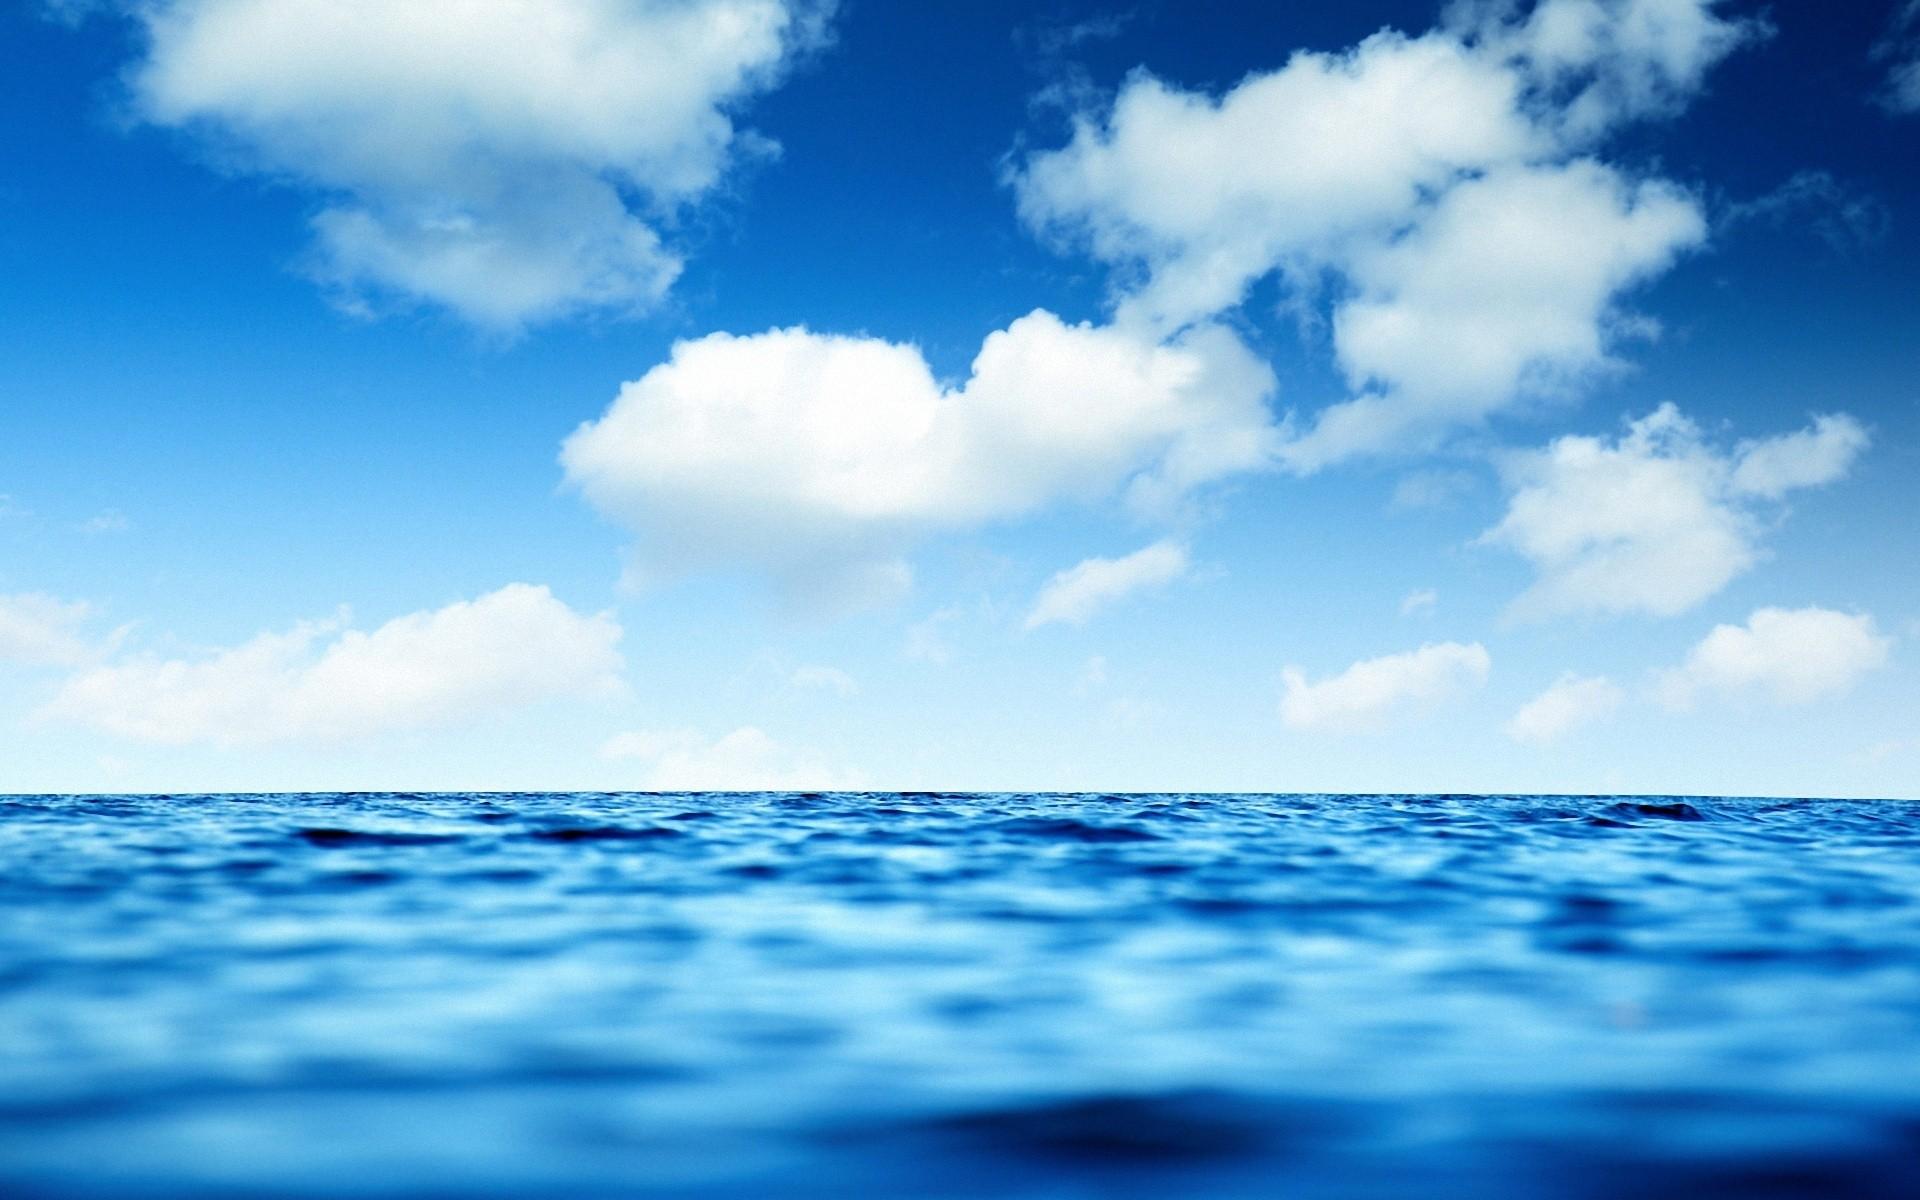 природа горизонт облака небо море nature horizon clouds the sky sea  № 2761325 бесплатно